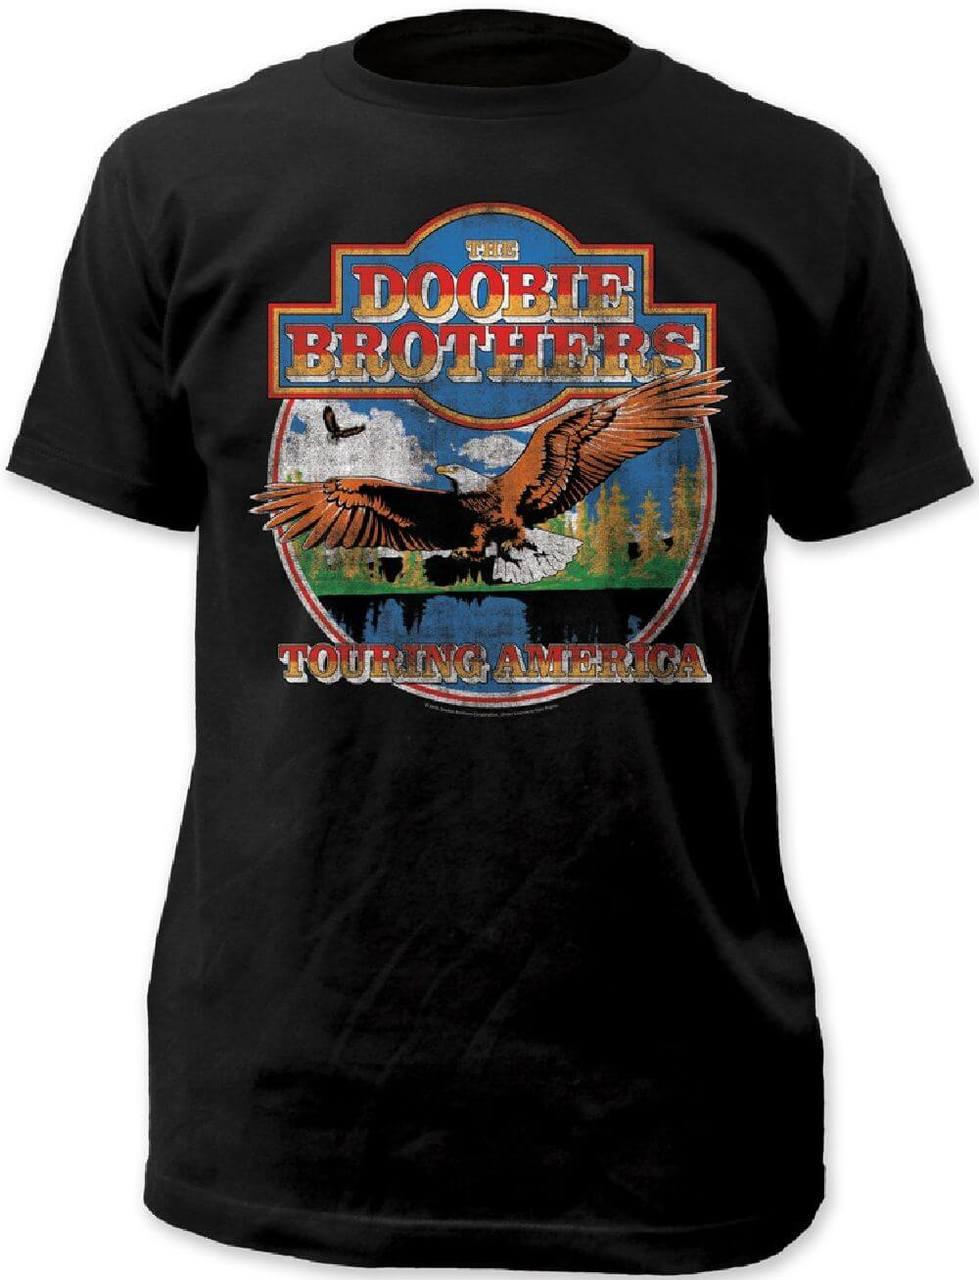 0128573384d The Doobie Brothers Touring America Men's Black Vintage Concert T-shirt